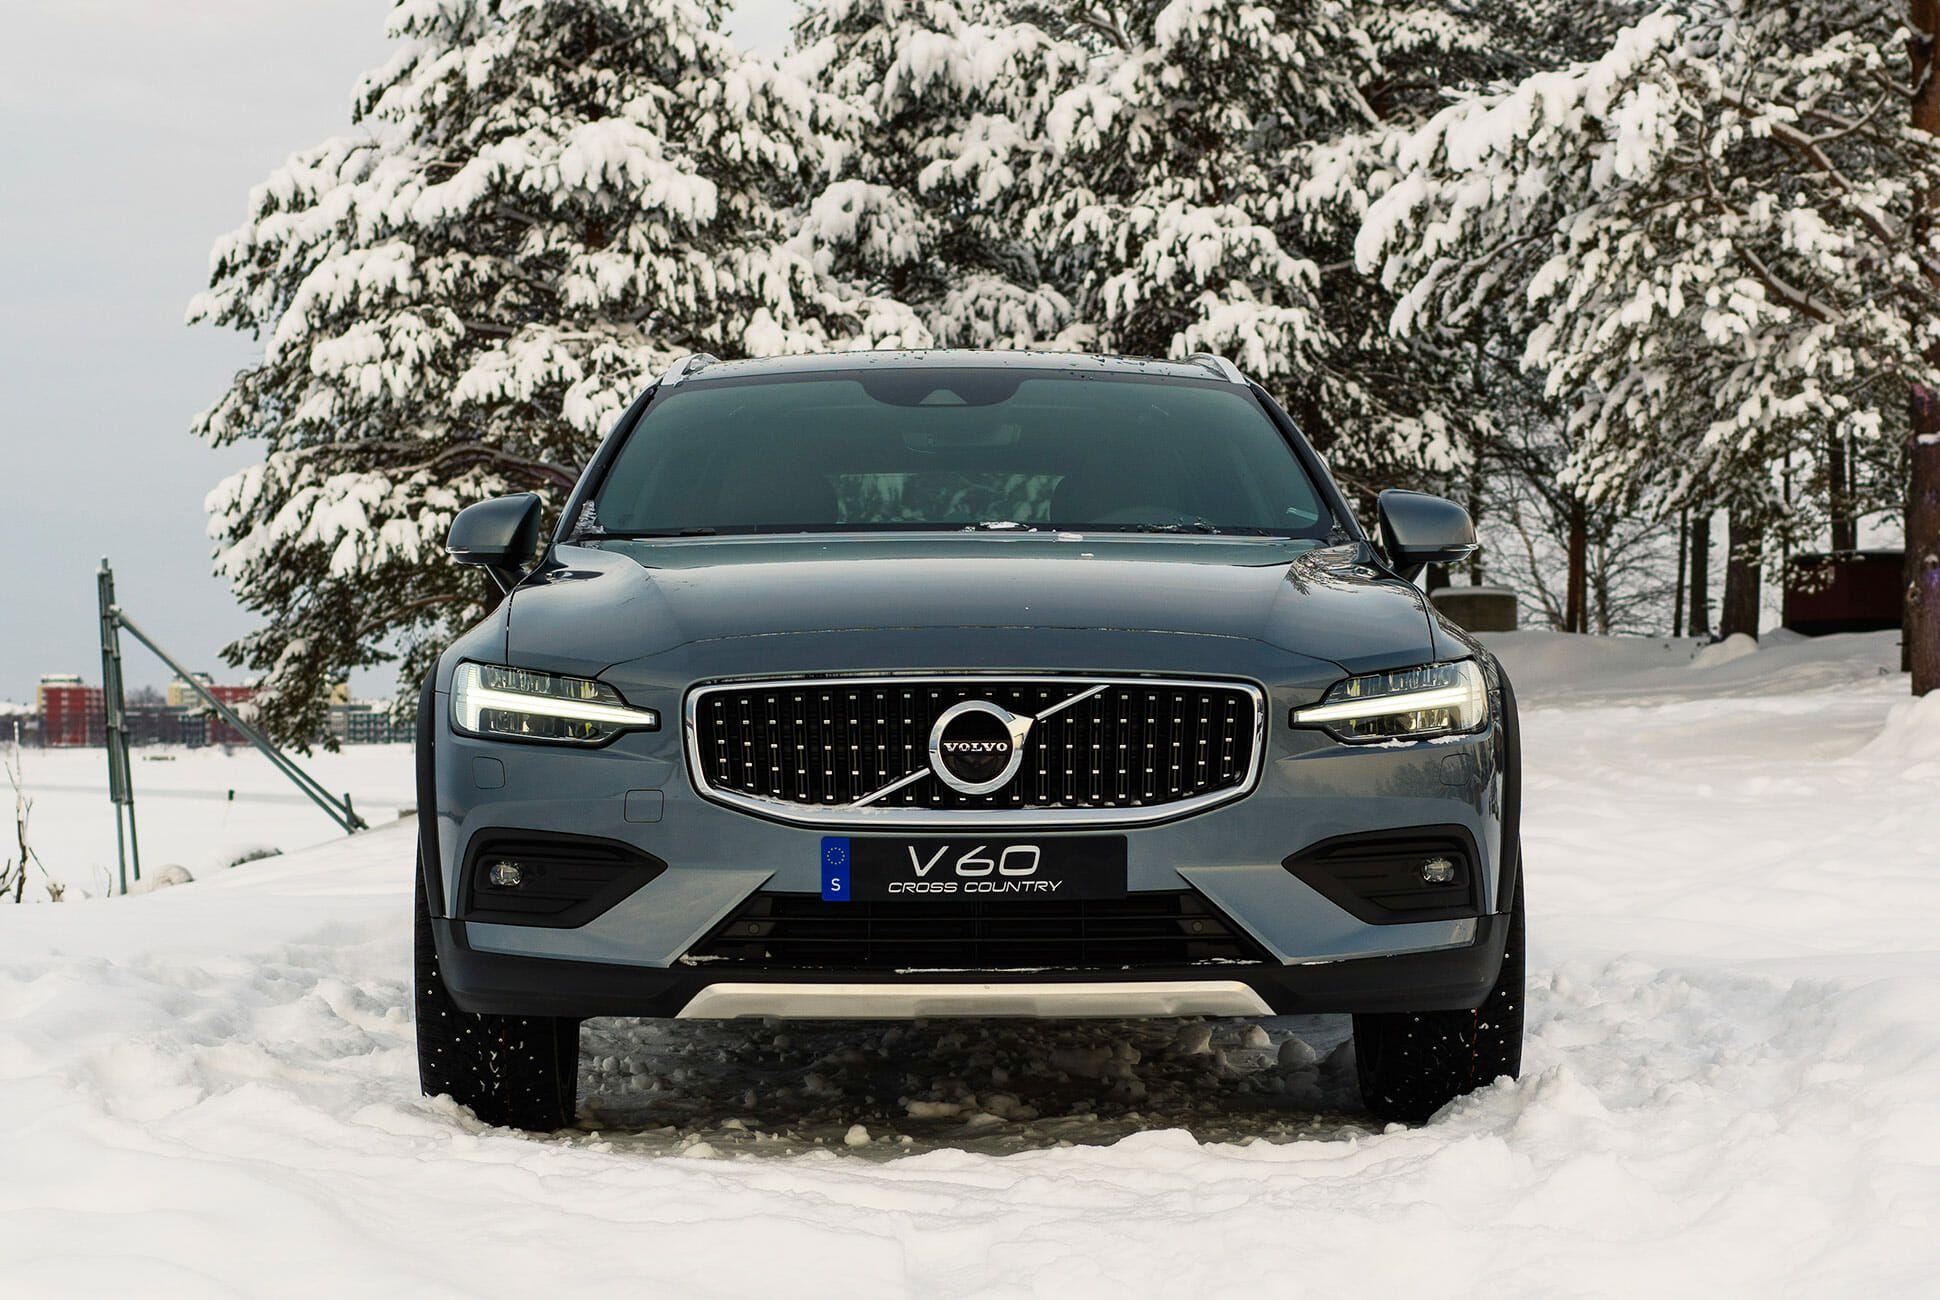 Volvo-V60-CC-gear-patrol-slide-1